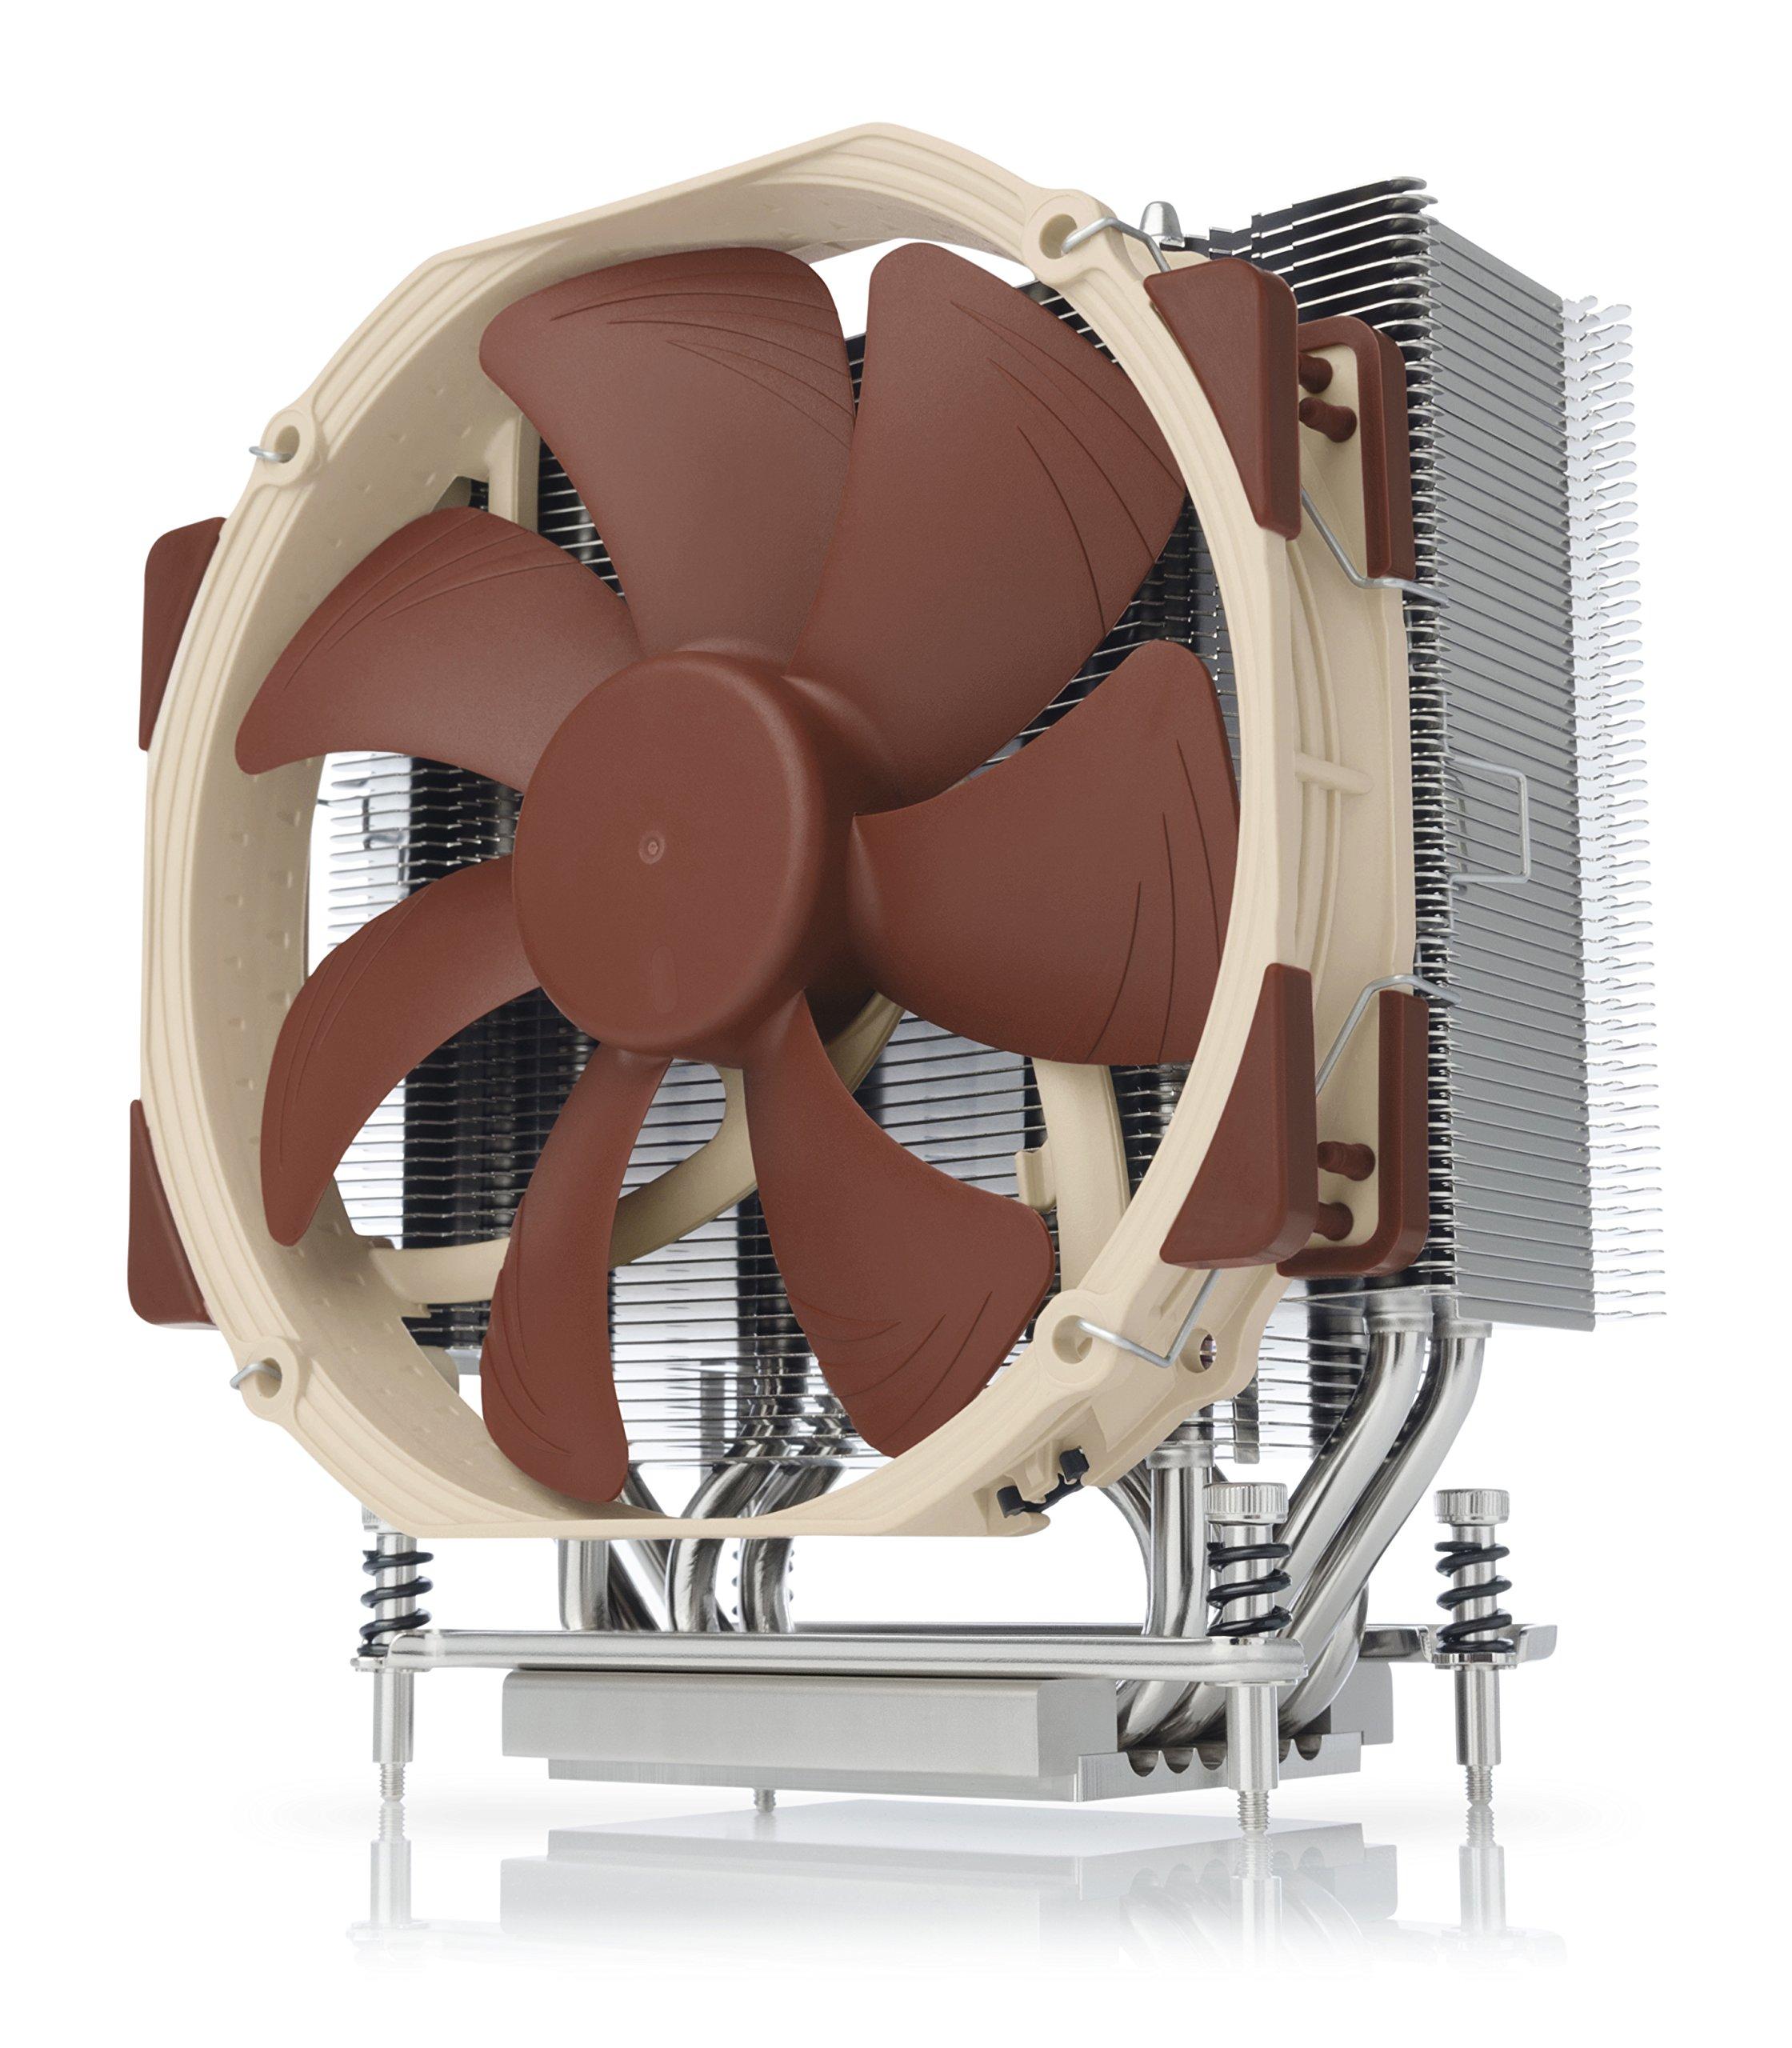 Noctua NH-U14S TR4-SP3 Premium-Grade 140mm CPU Cooler for AMD TR4/SP3 by NOCTUA